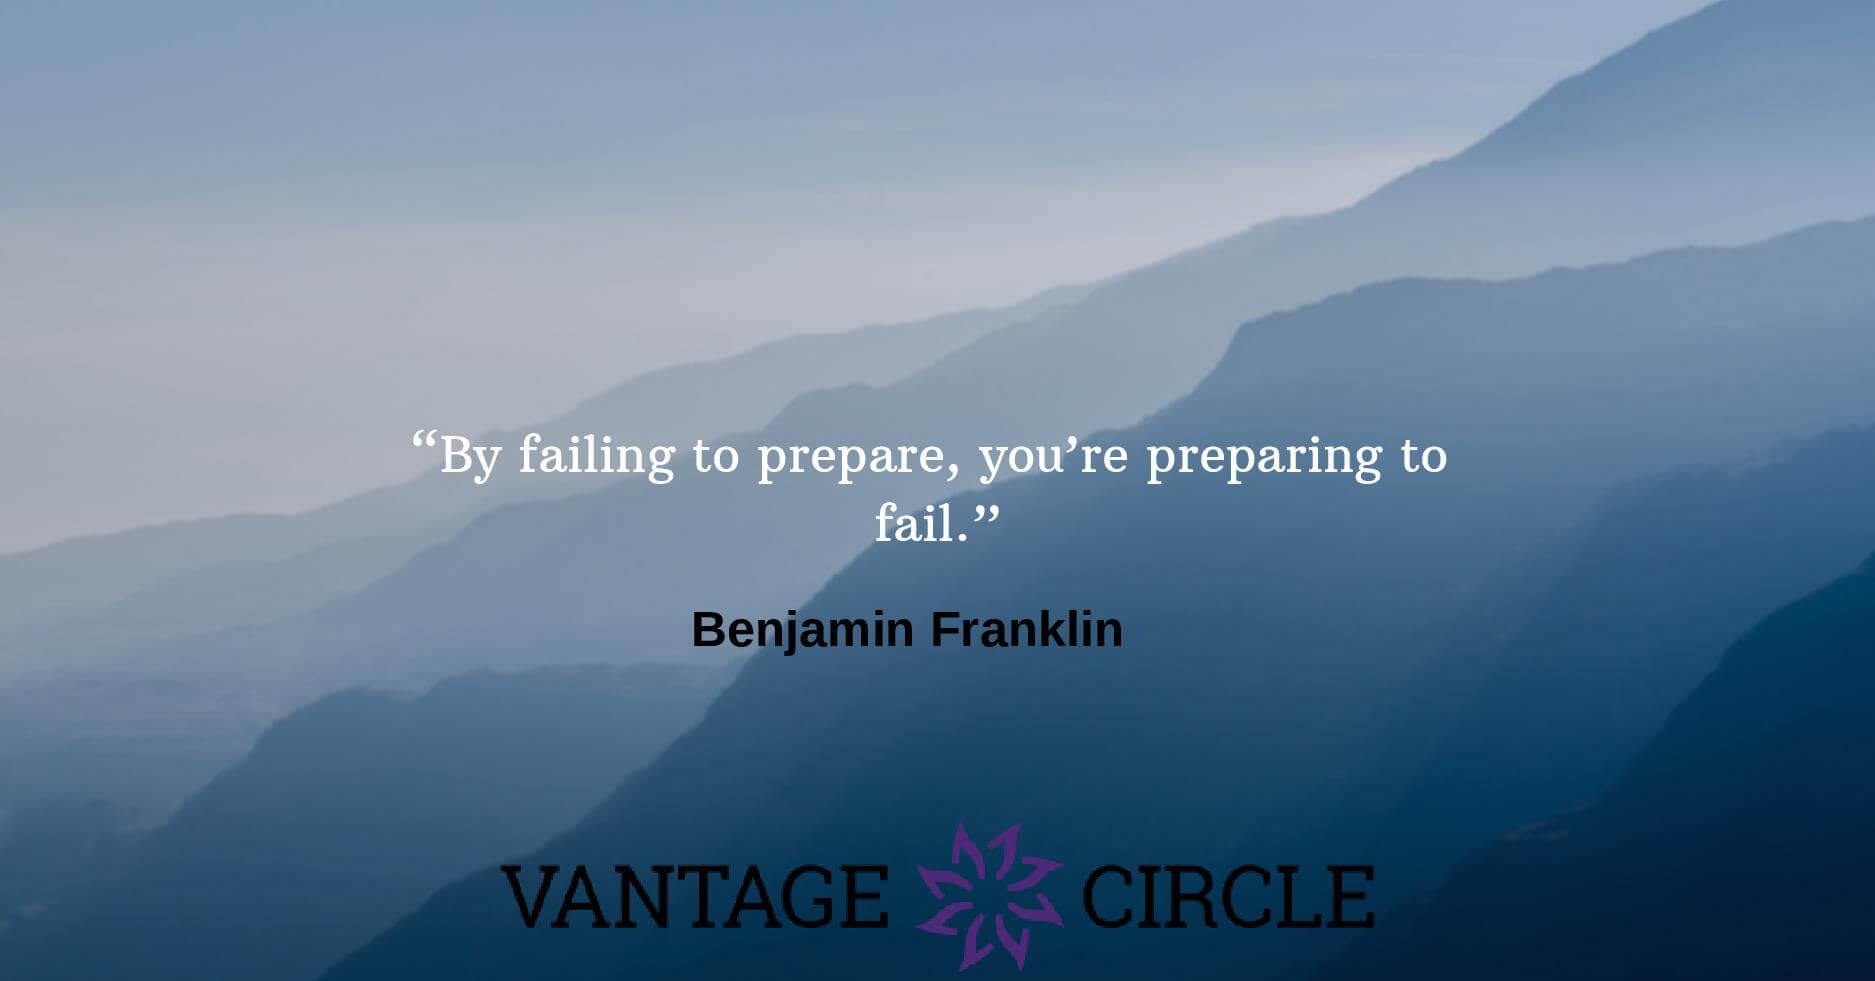 Employee-motivational-quotes-Benjamin-Franklin